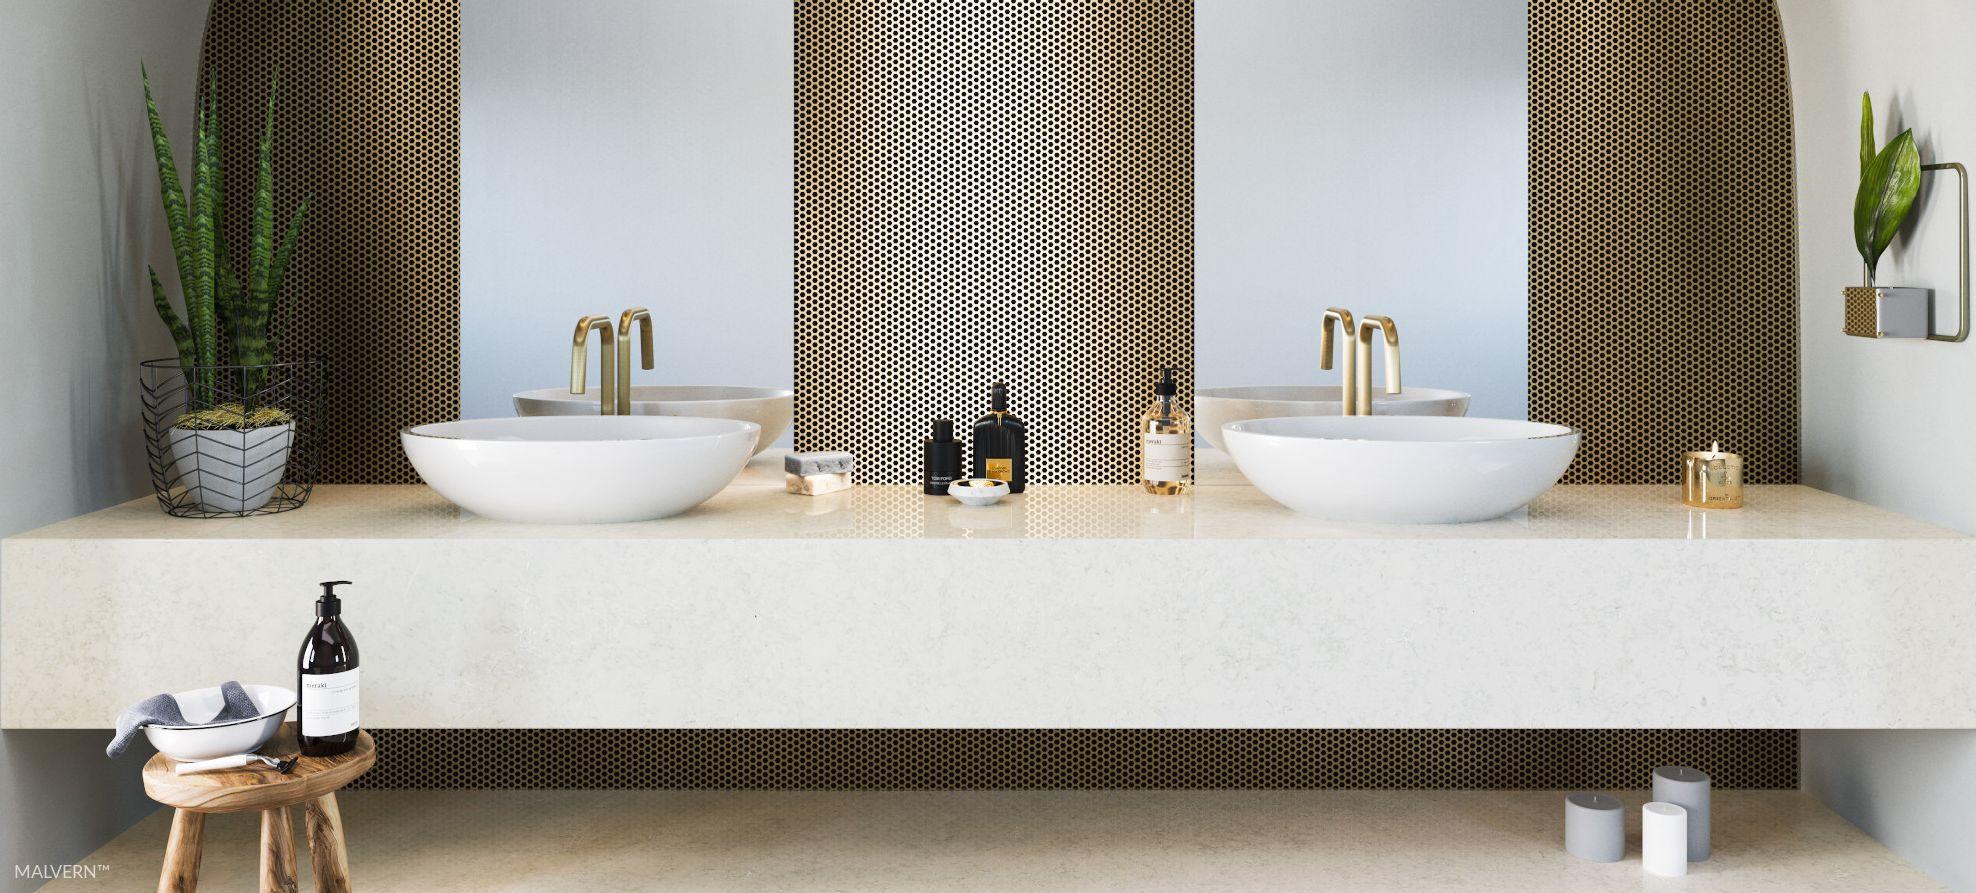 Cambria-quartz-countertops-Malvern-bathroom